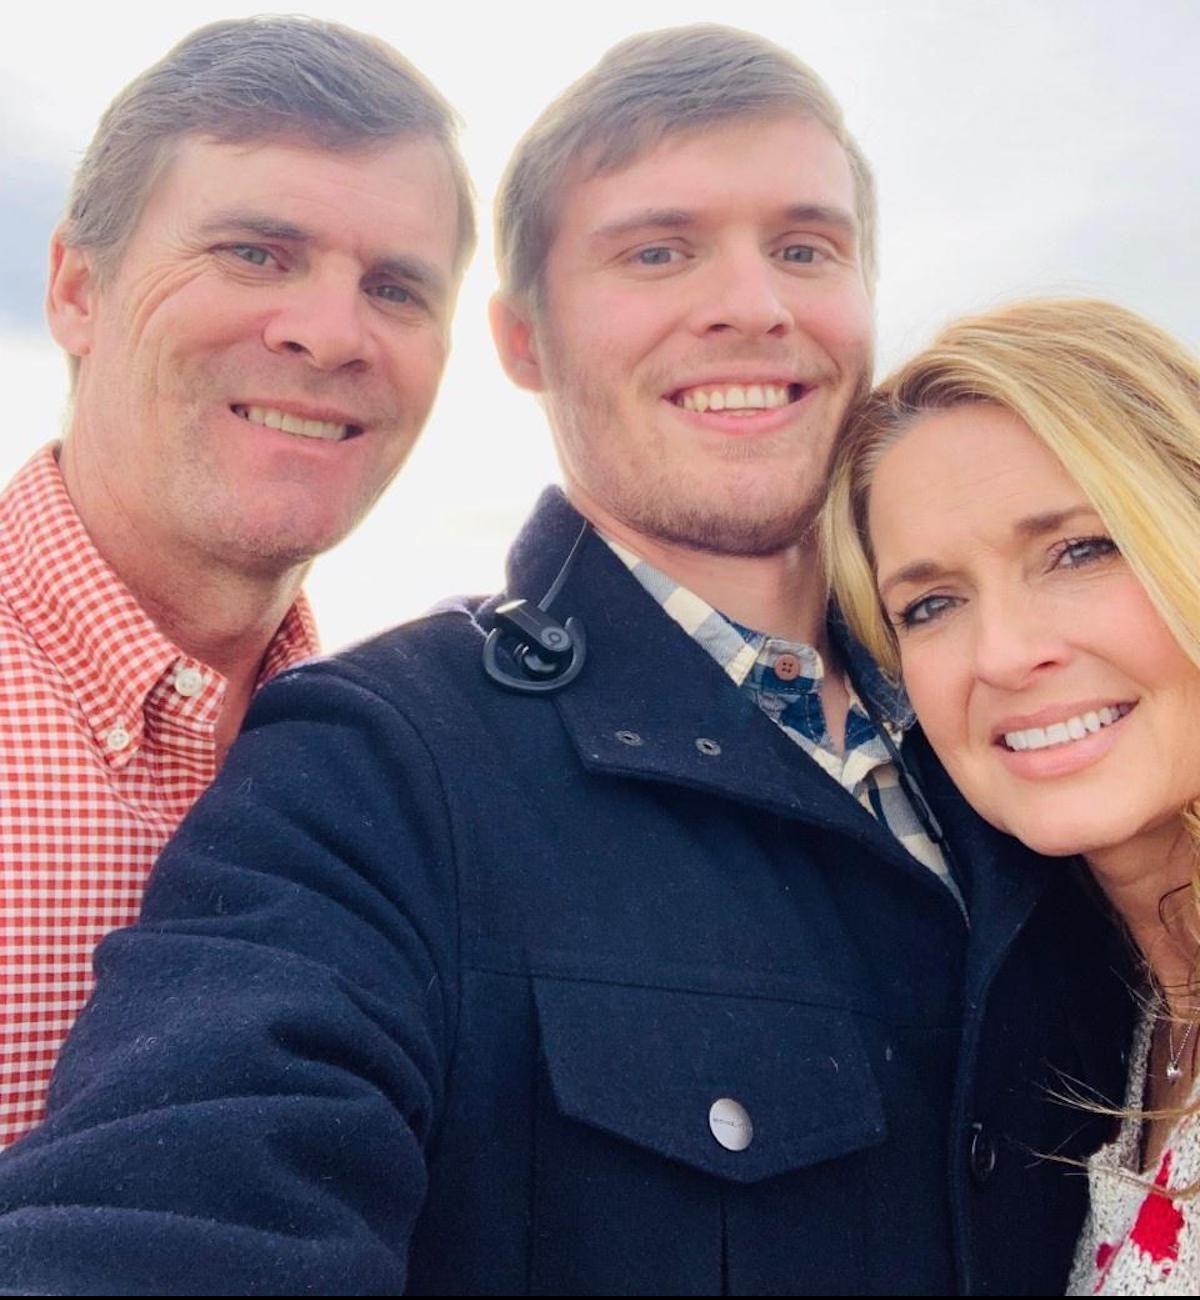 (L-R) Brad Calhoun, Austin Calhoun and Angie Calhoun of Puckett, Mississippi.